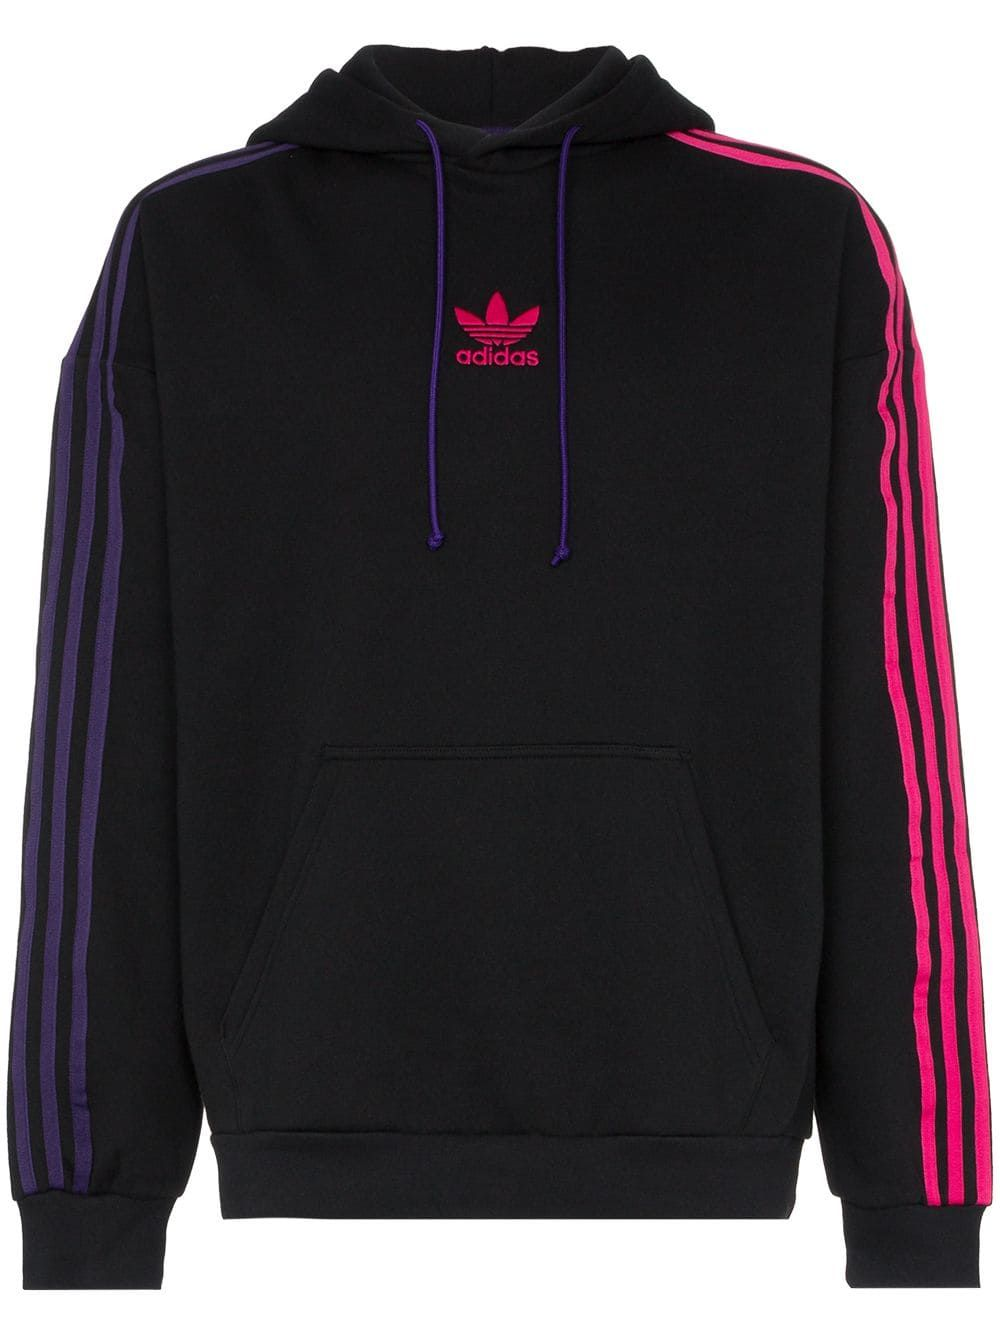 ADIDAS Purple Hoodie Striped Sleeve Sweatshirt